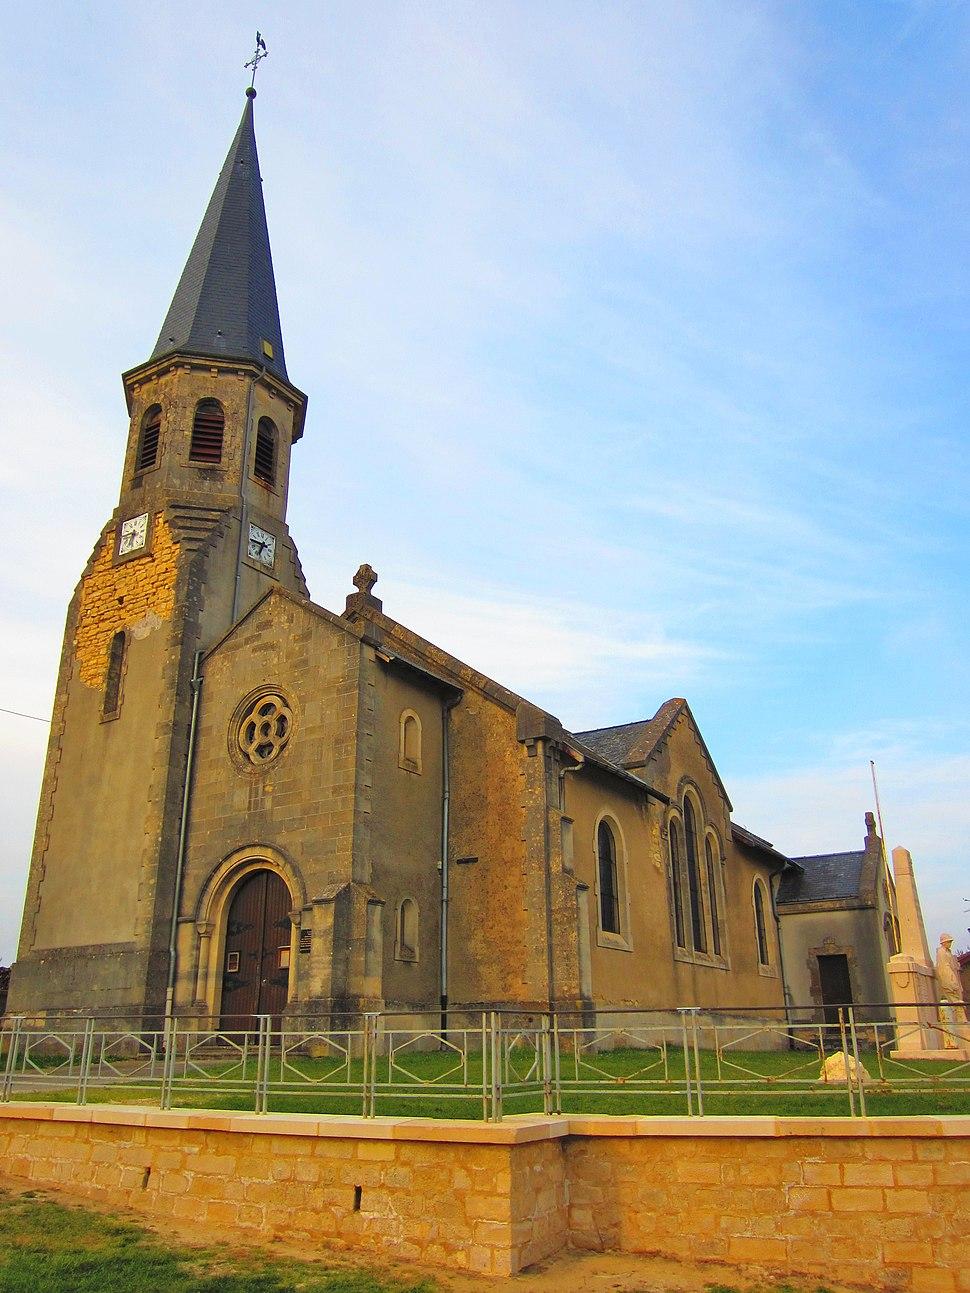 The church in Azannes-et-Soumazannes